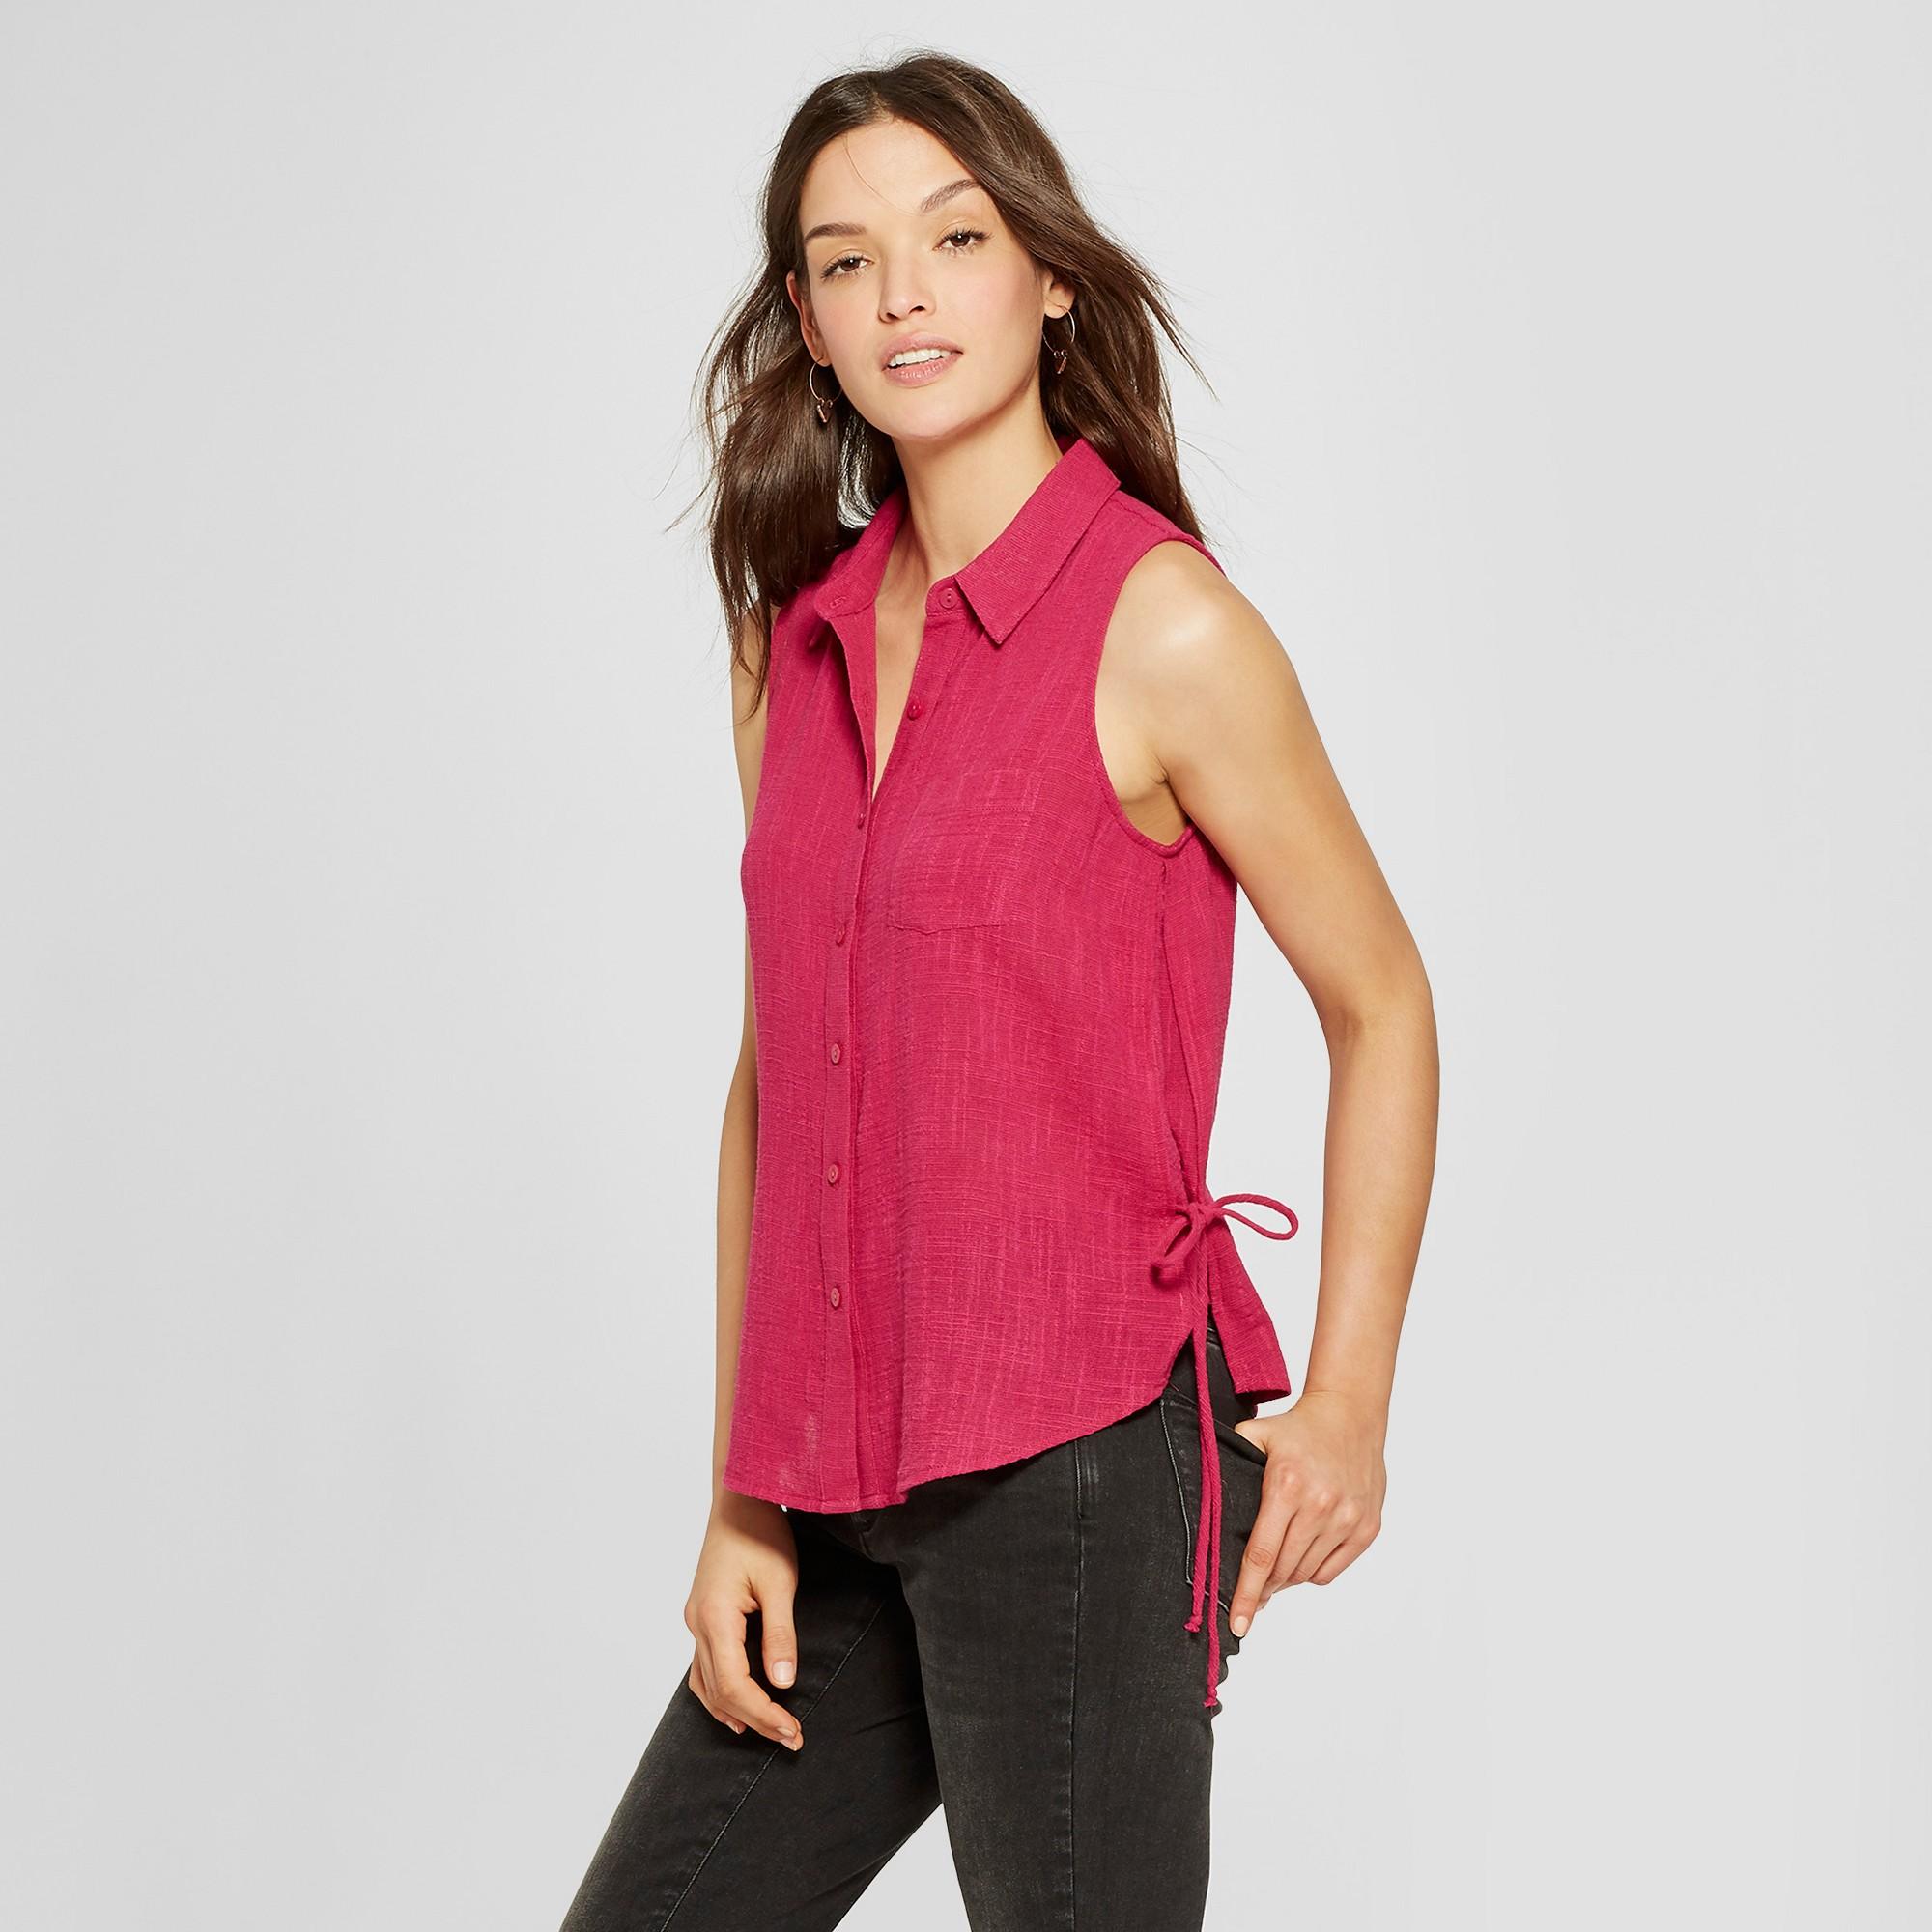 874c0e100 Women's Side Tie Button Front Tank - Universal Thread Pink Xxl ...